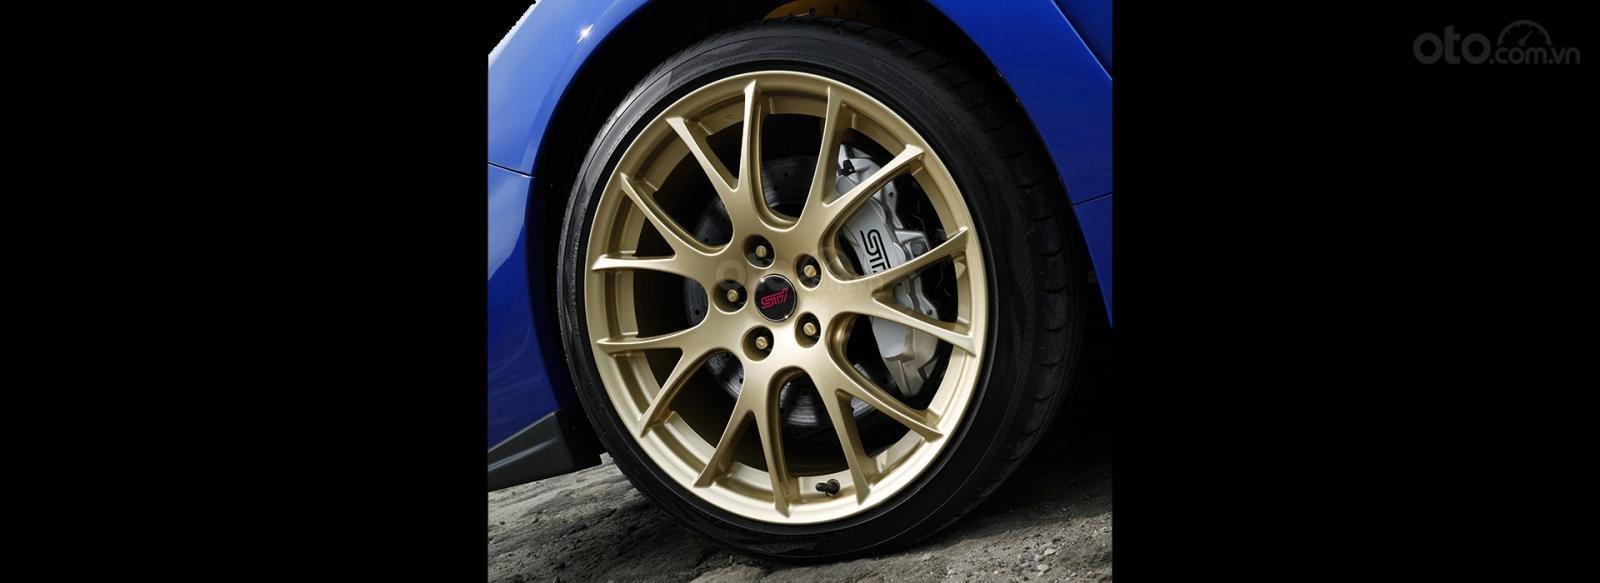 Subaru WRX STI EJ20 Final Edition đặc sắc